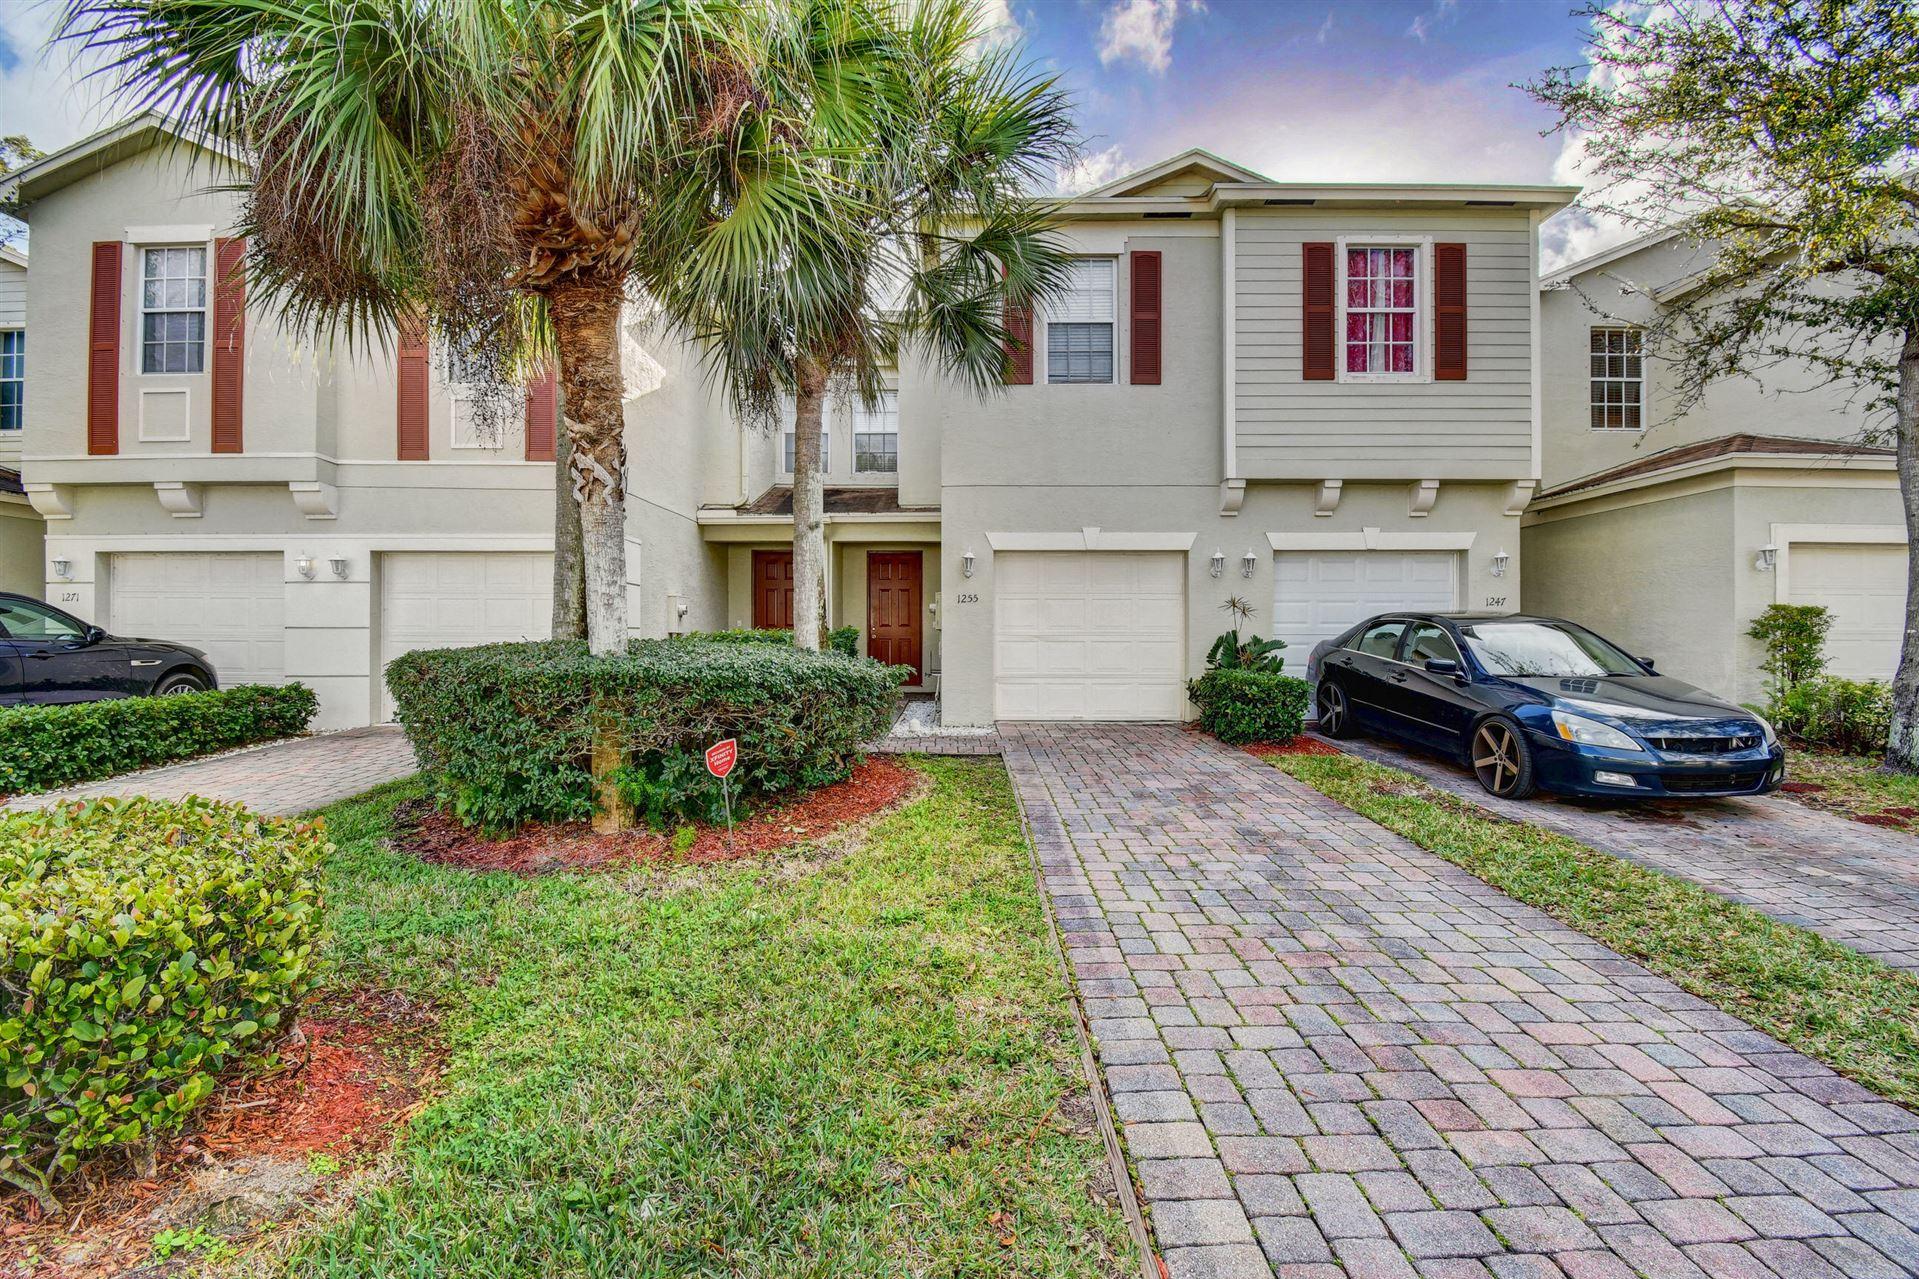 1255 Sweet Violet Court, West Palm Beach, FL 33415 - #: RX-10600635